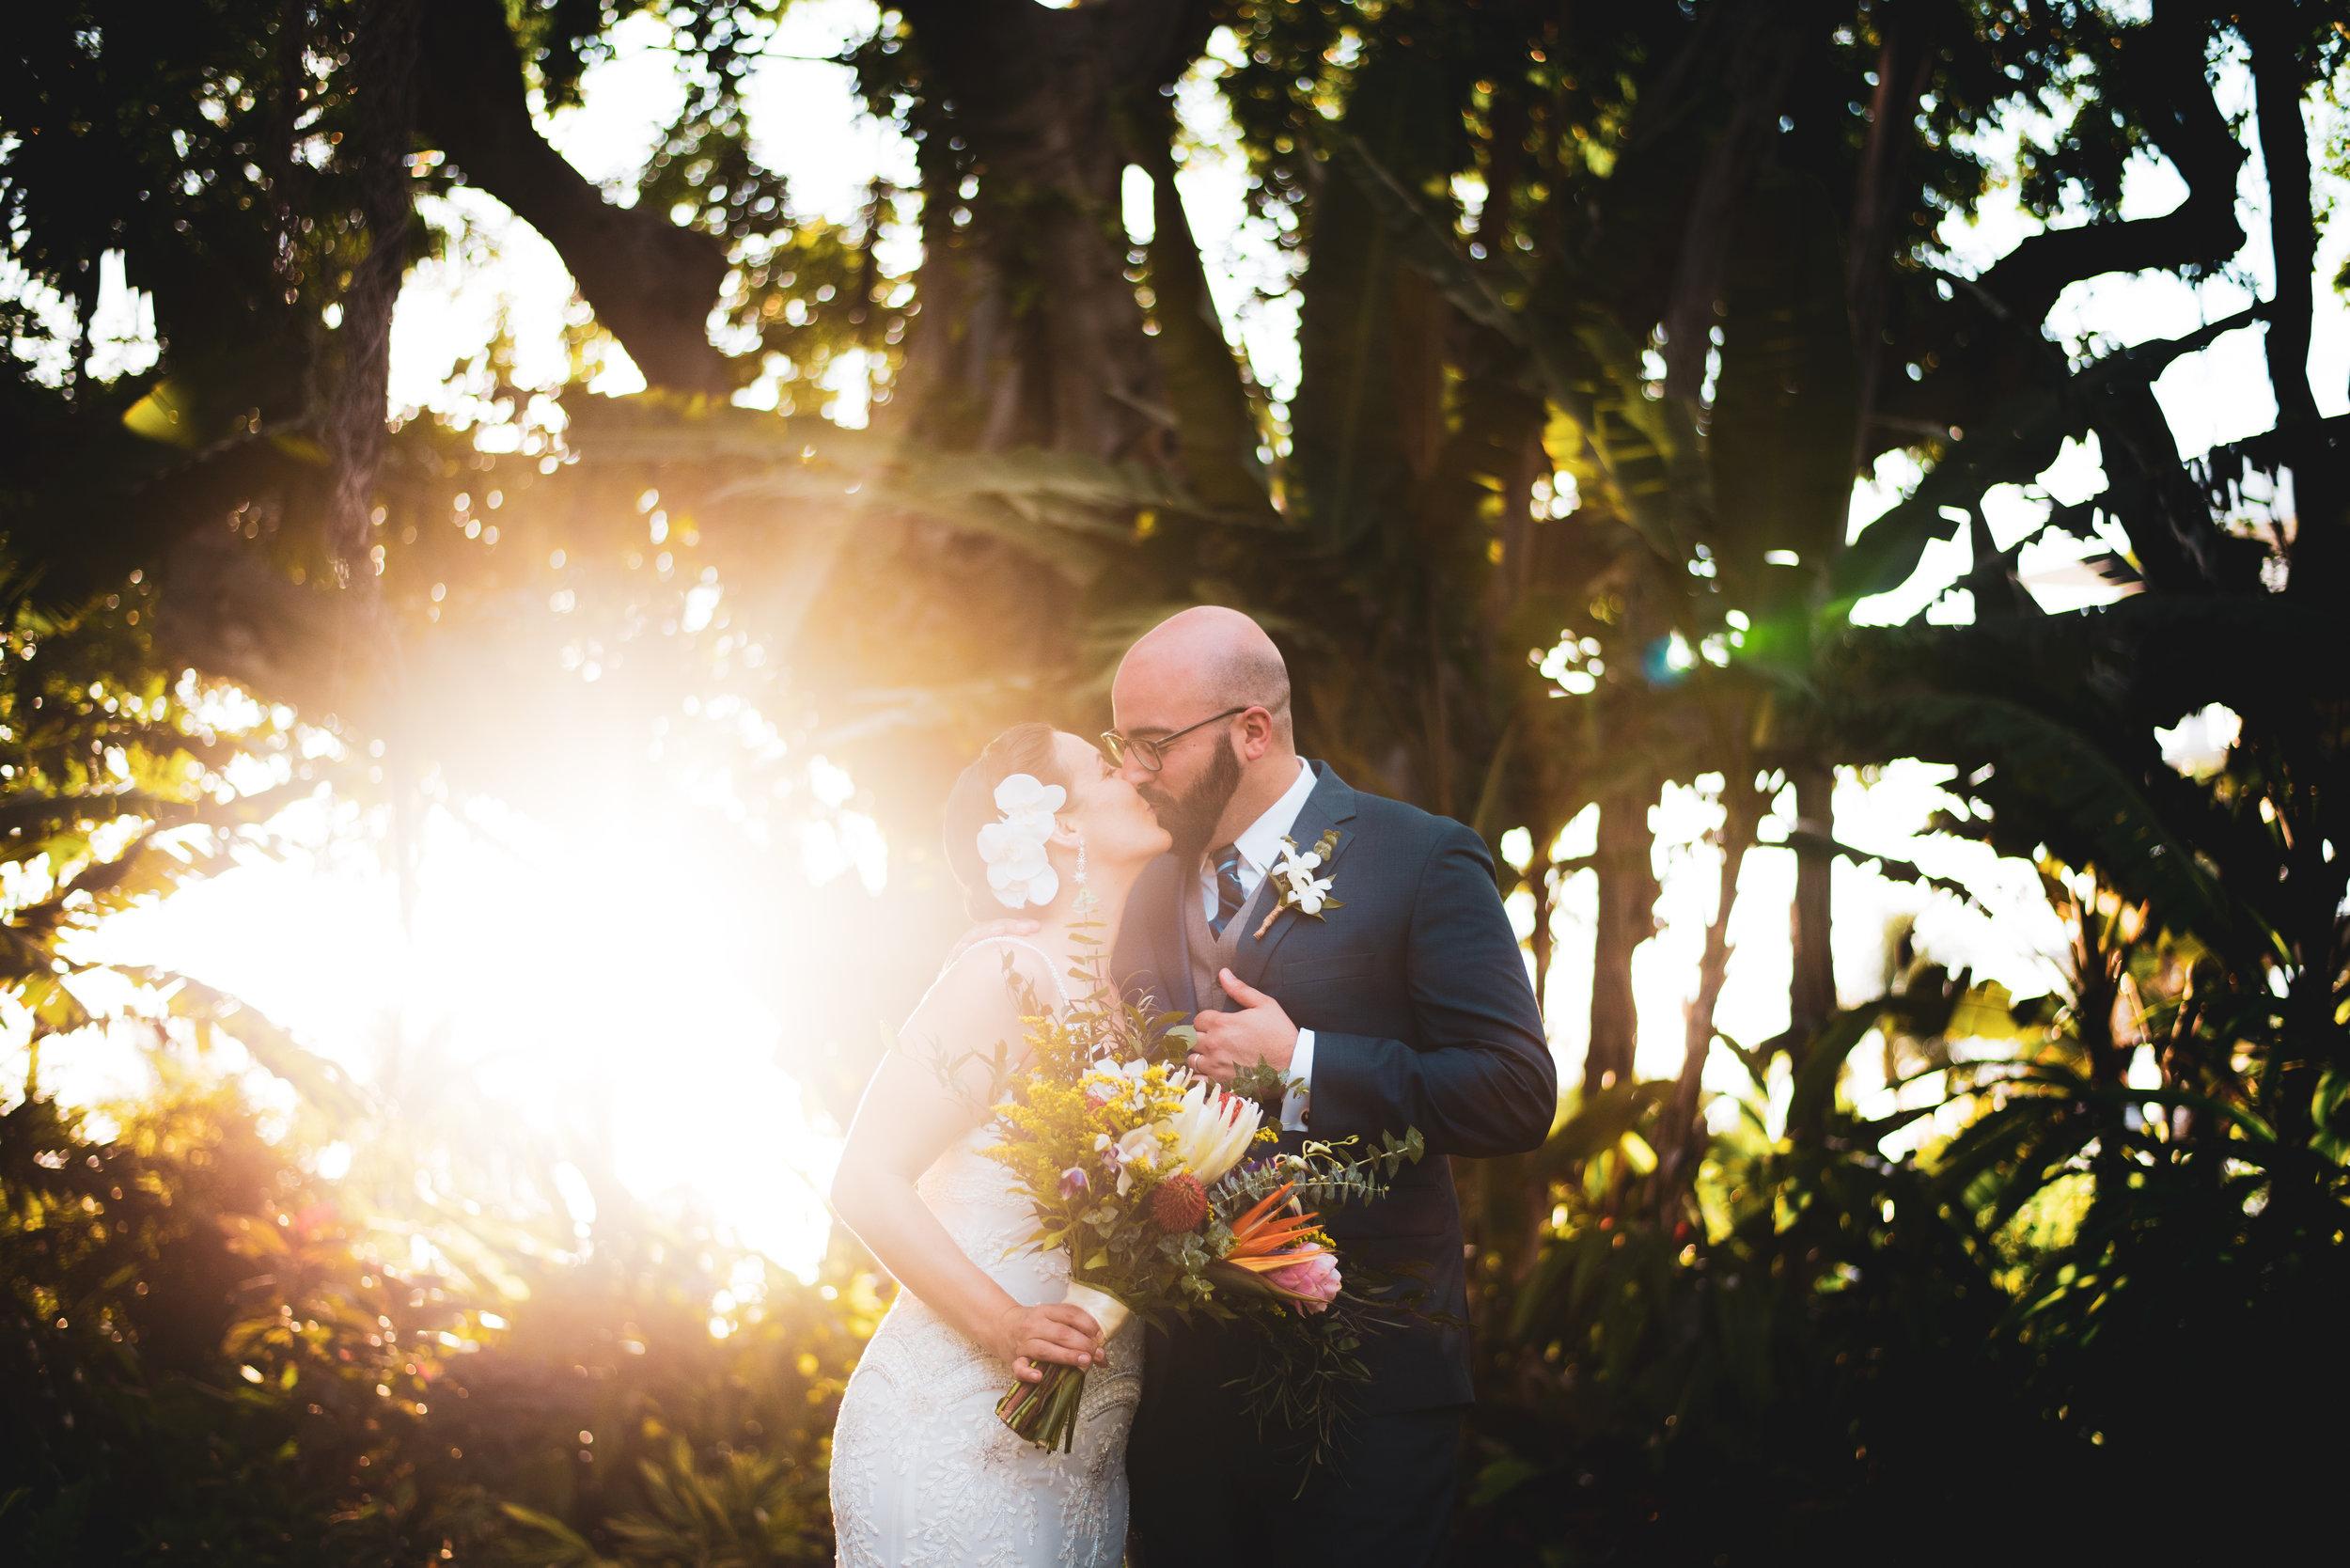 miami beach botanical garden florida wedding © kelilina photography 20190601192426-5.jpg